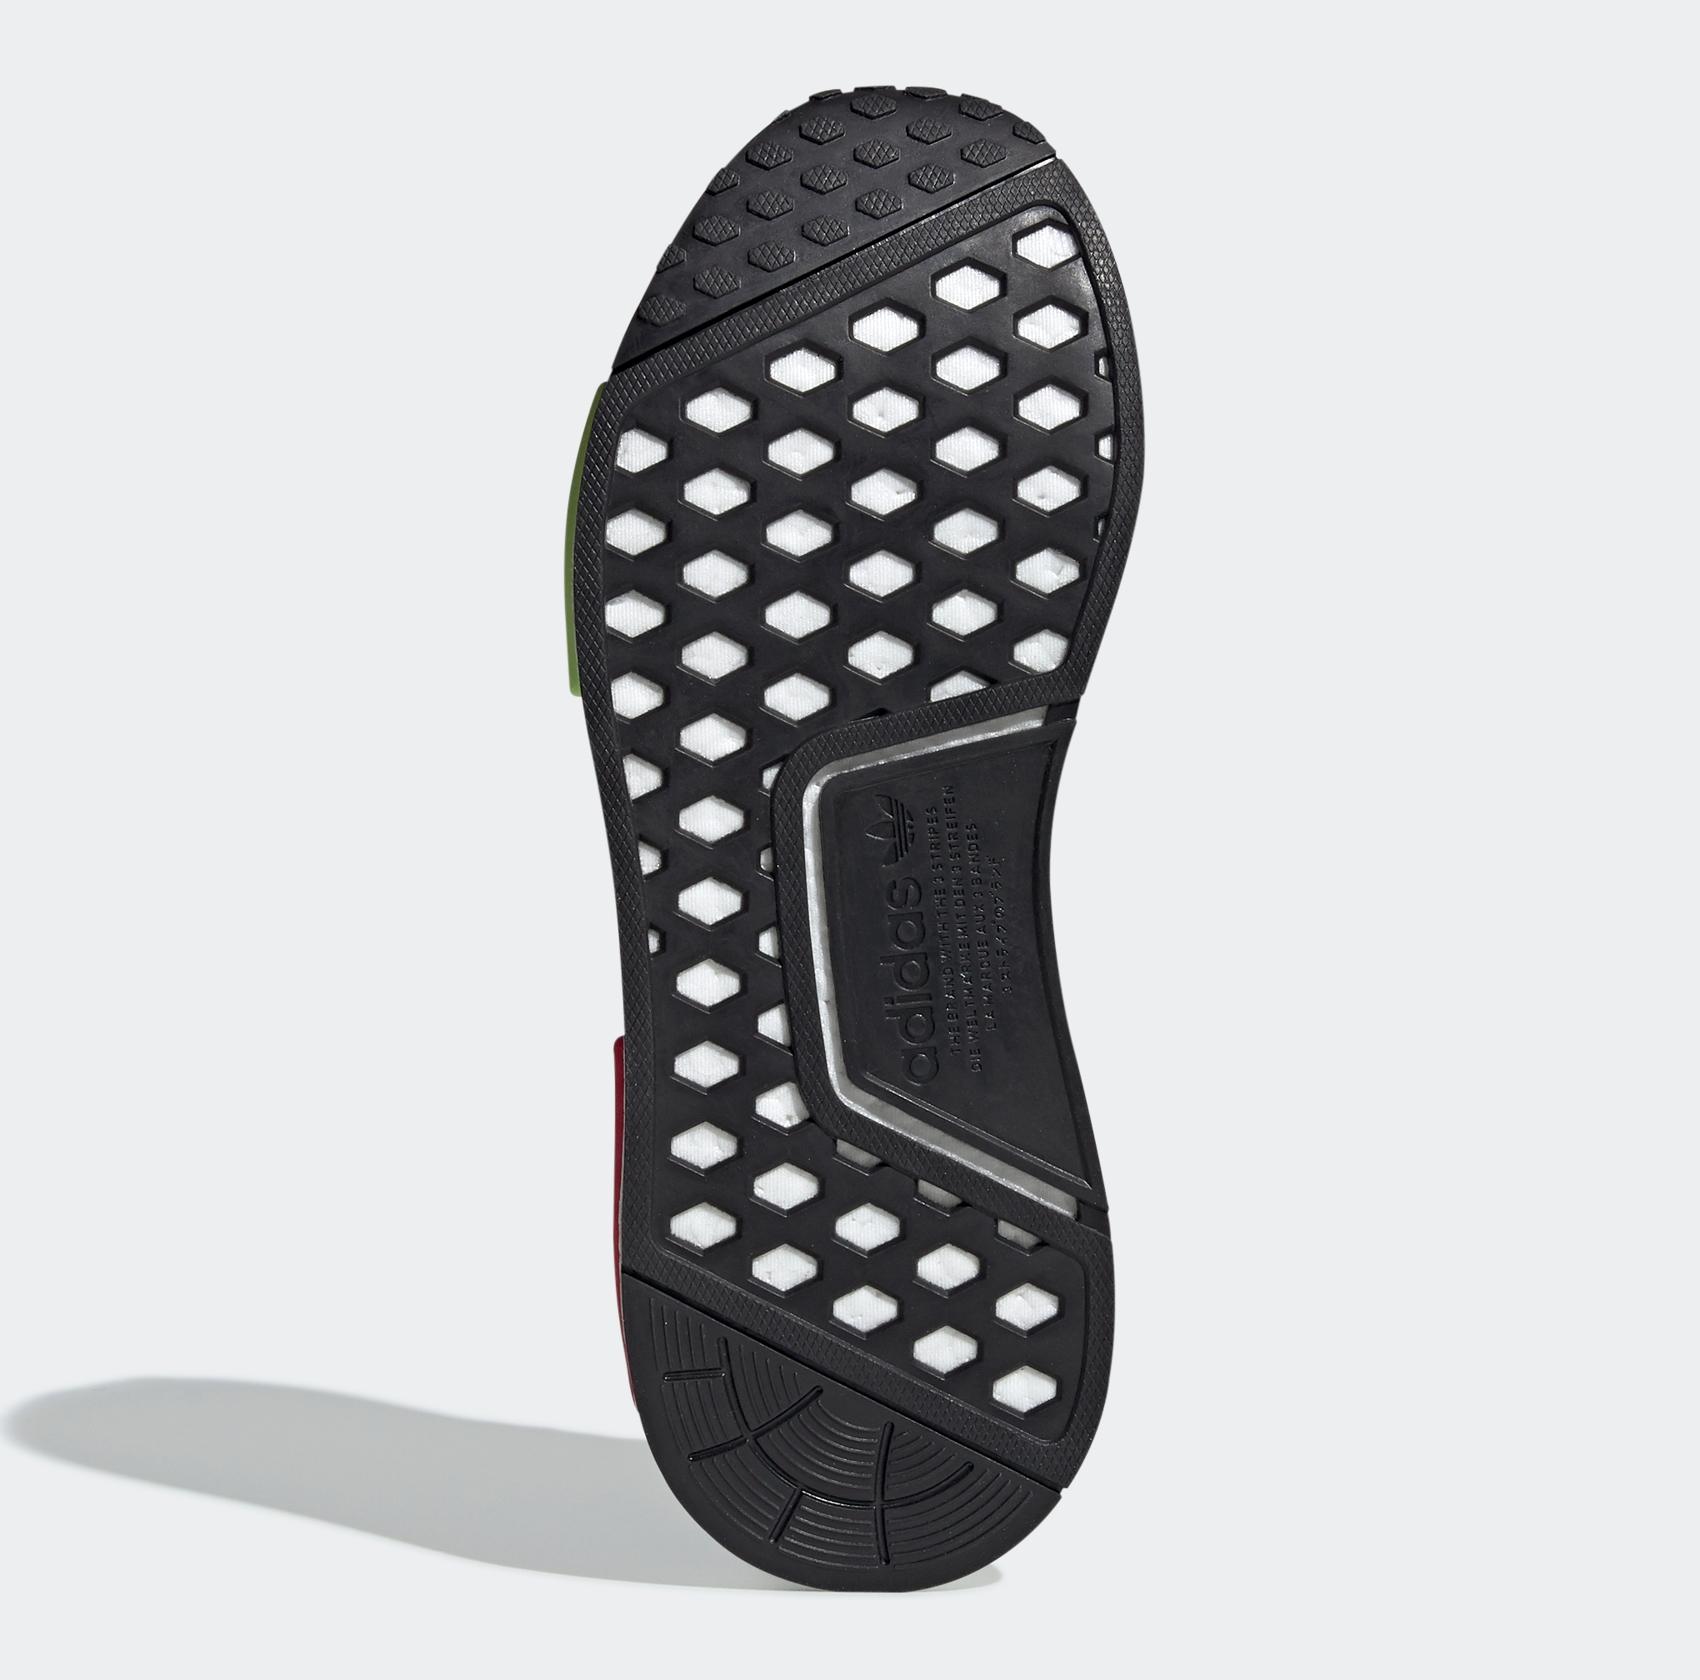 Tarjous adidas Originals NMD R1 Musta EBD30 The